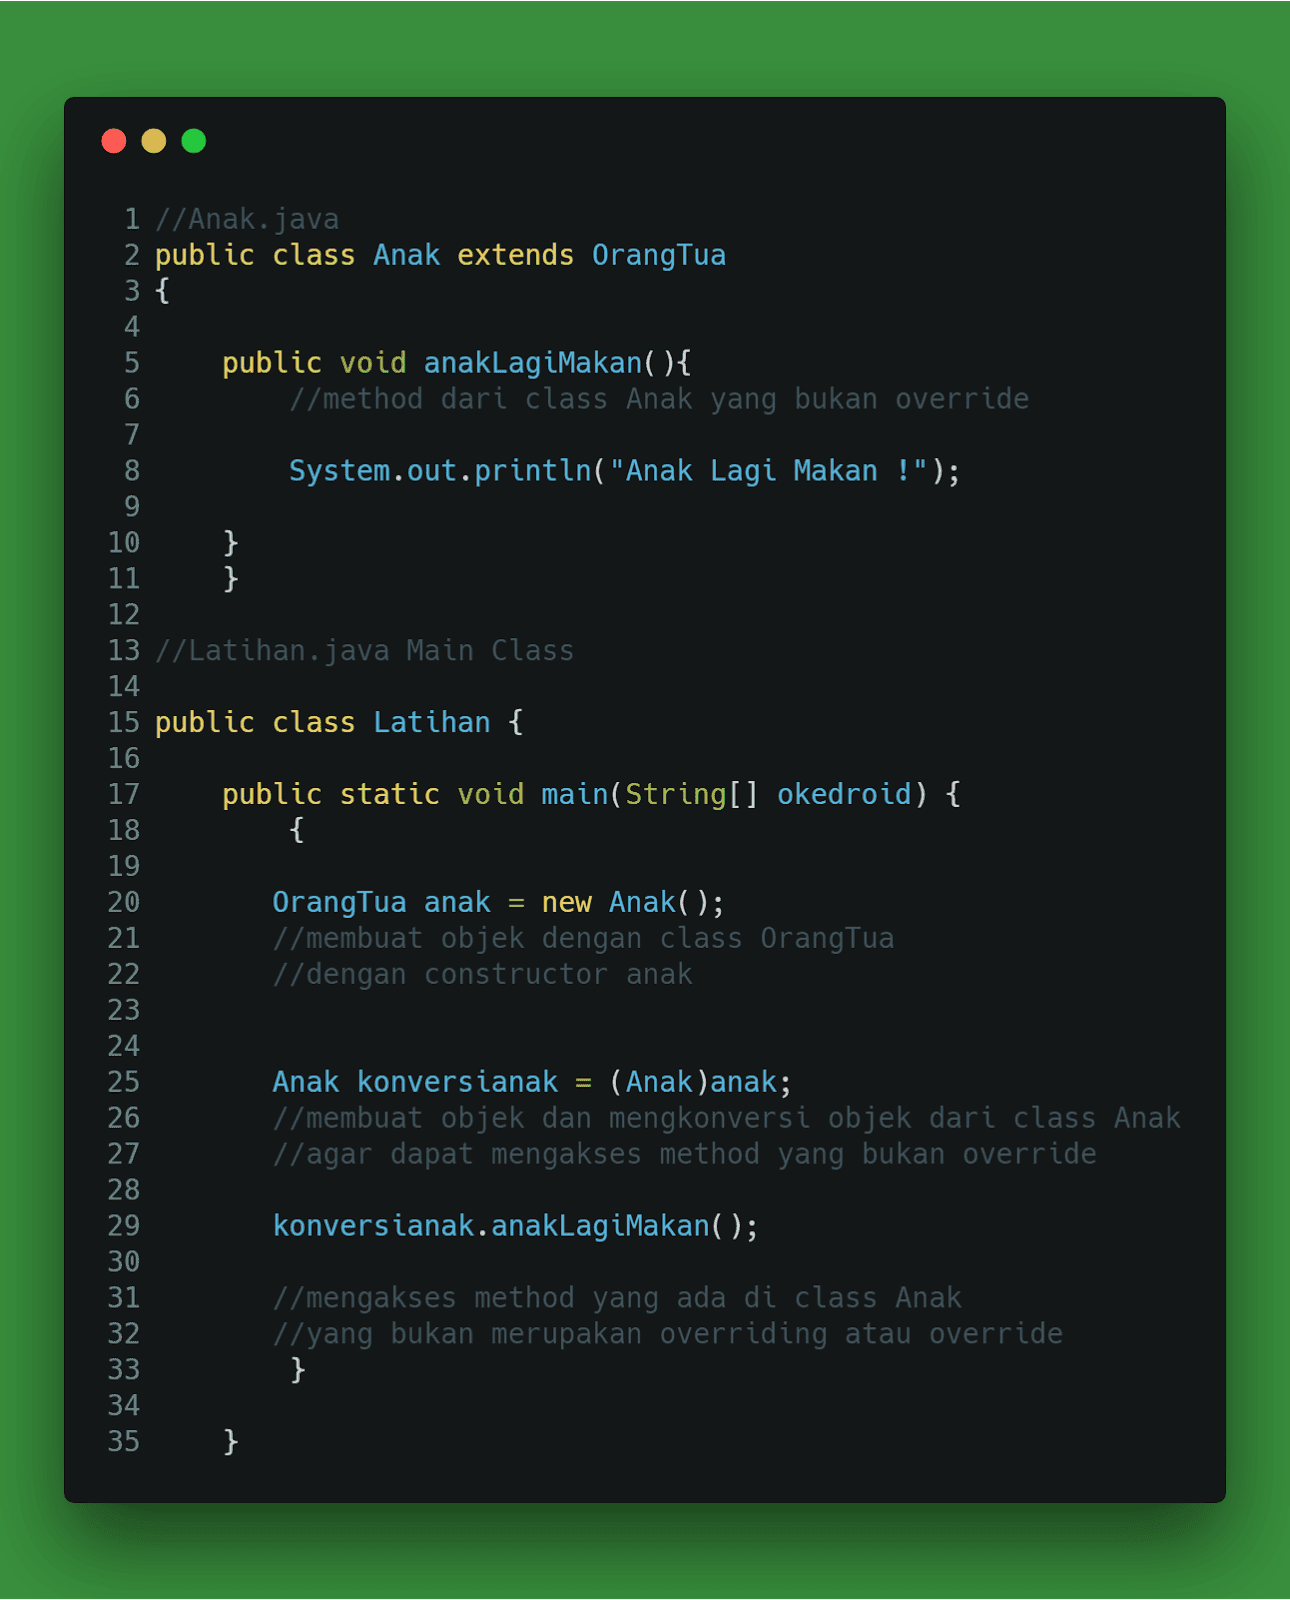 Contoh Program Polymorphism Java Netbeans : contoh, program, polymorphism, netbeans, Belajar, Polymorphism, Bahasa, Pemrograman, Okedroid, Coding, Android